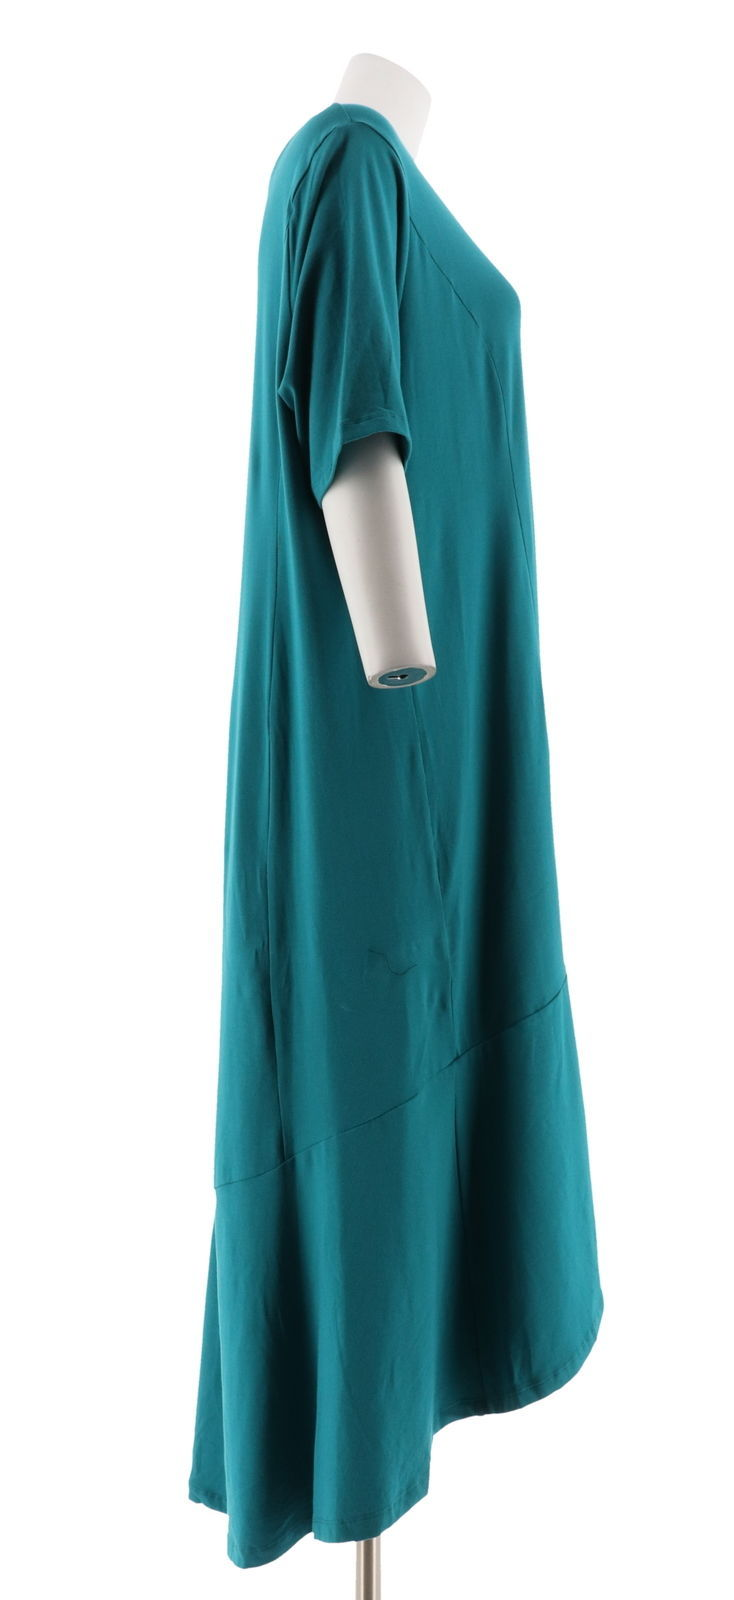 Isaac Mizrahi Petite Elbow Slv Knit Maxi Dress Forest Teal P1X NEW A308002